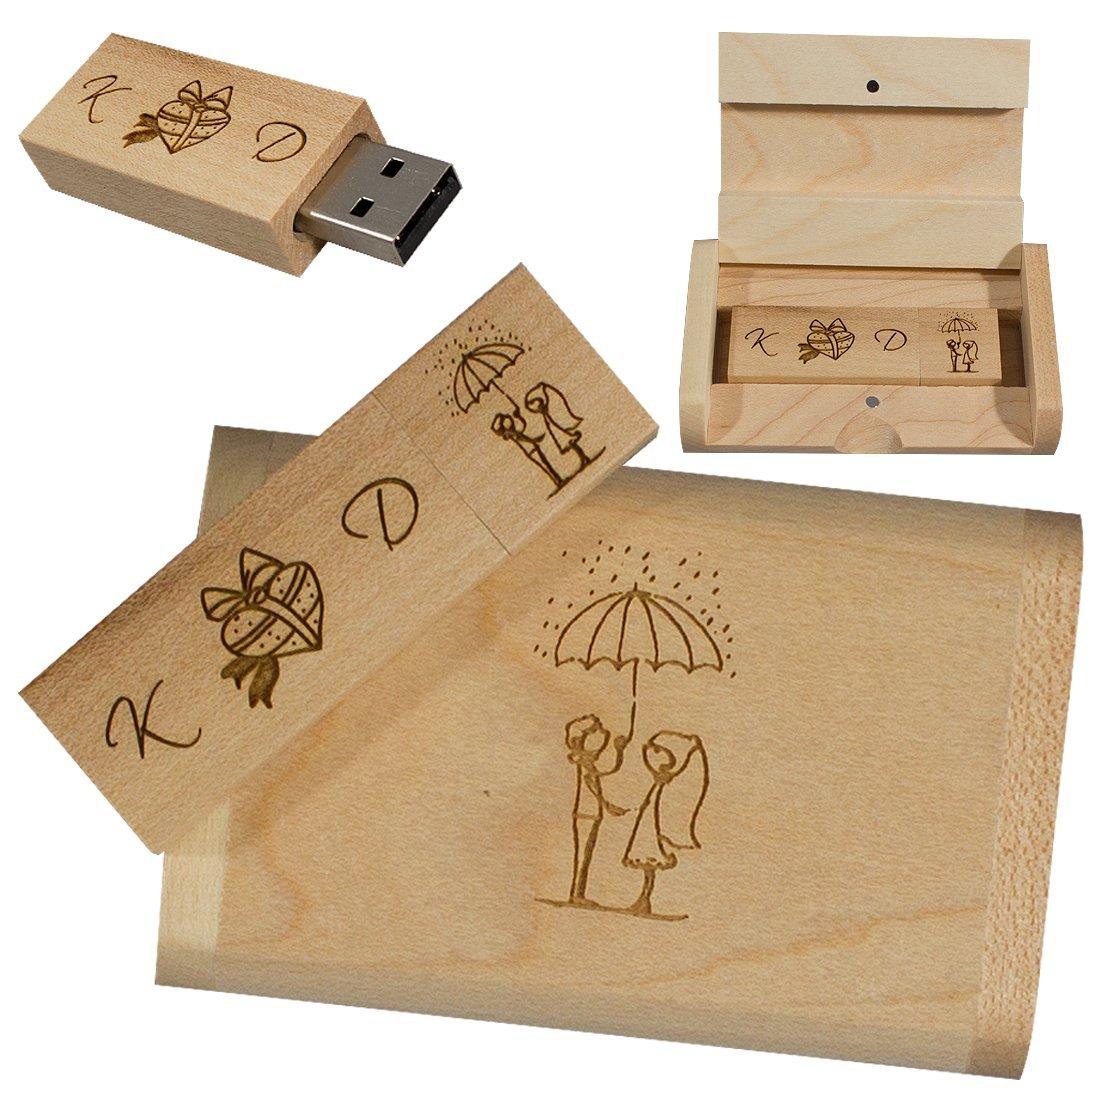 personalisierte geschenke geschenkboutique tina. Black Bedroom Furniture Sets. Home Design Ideas